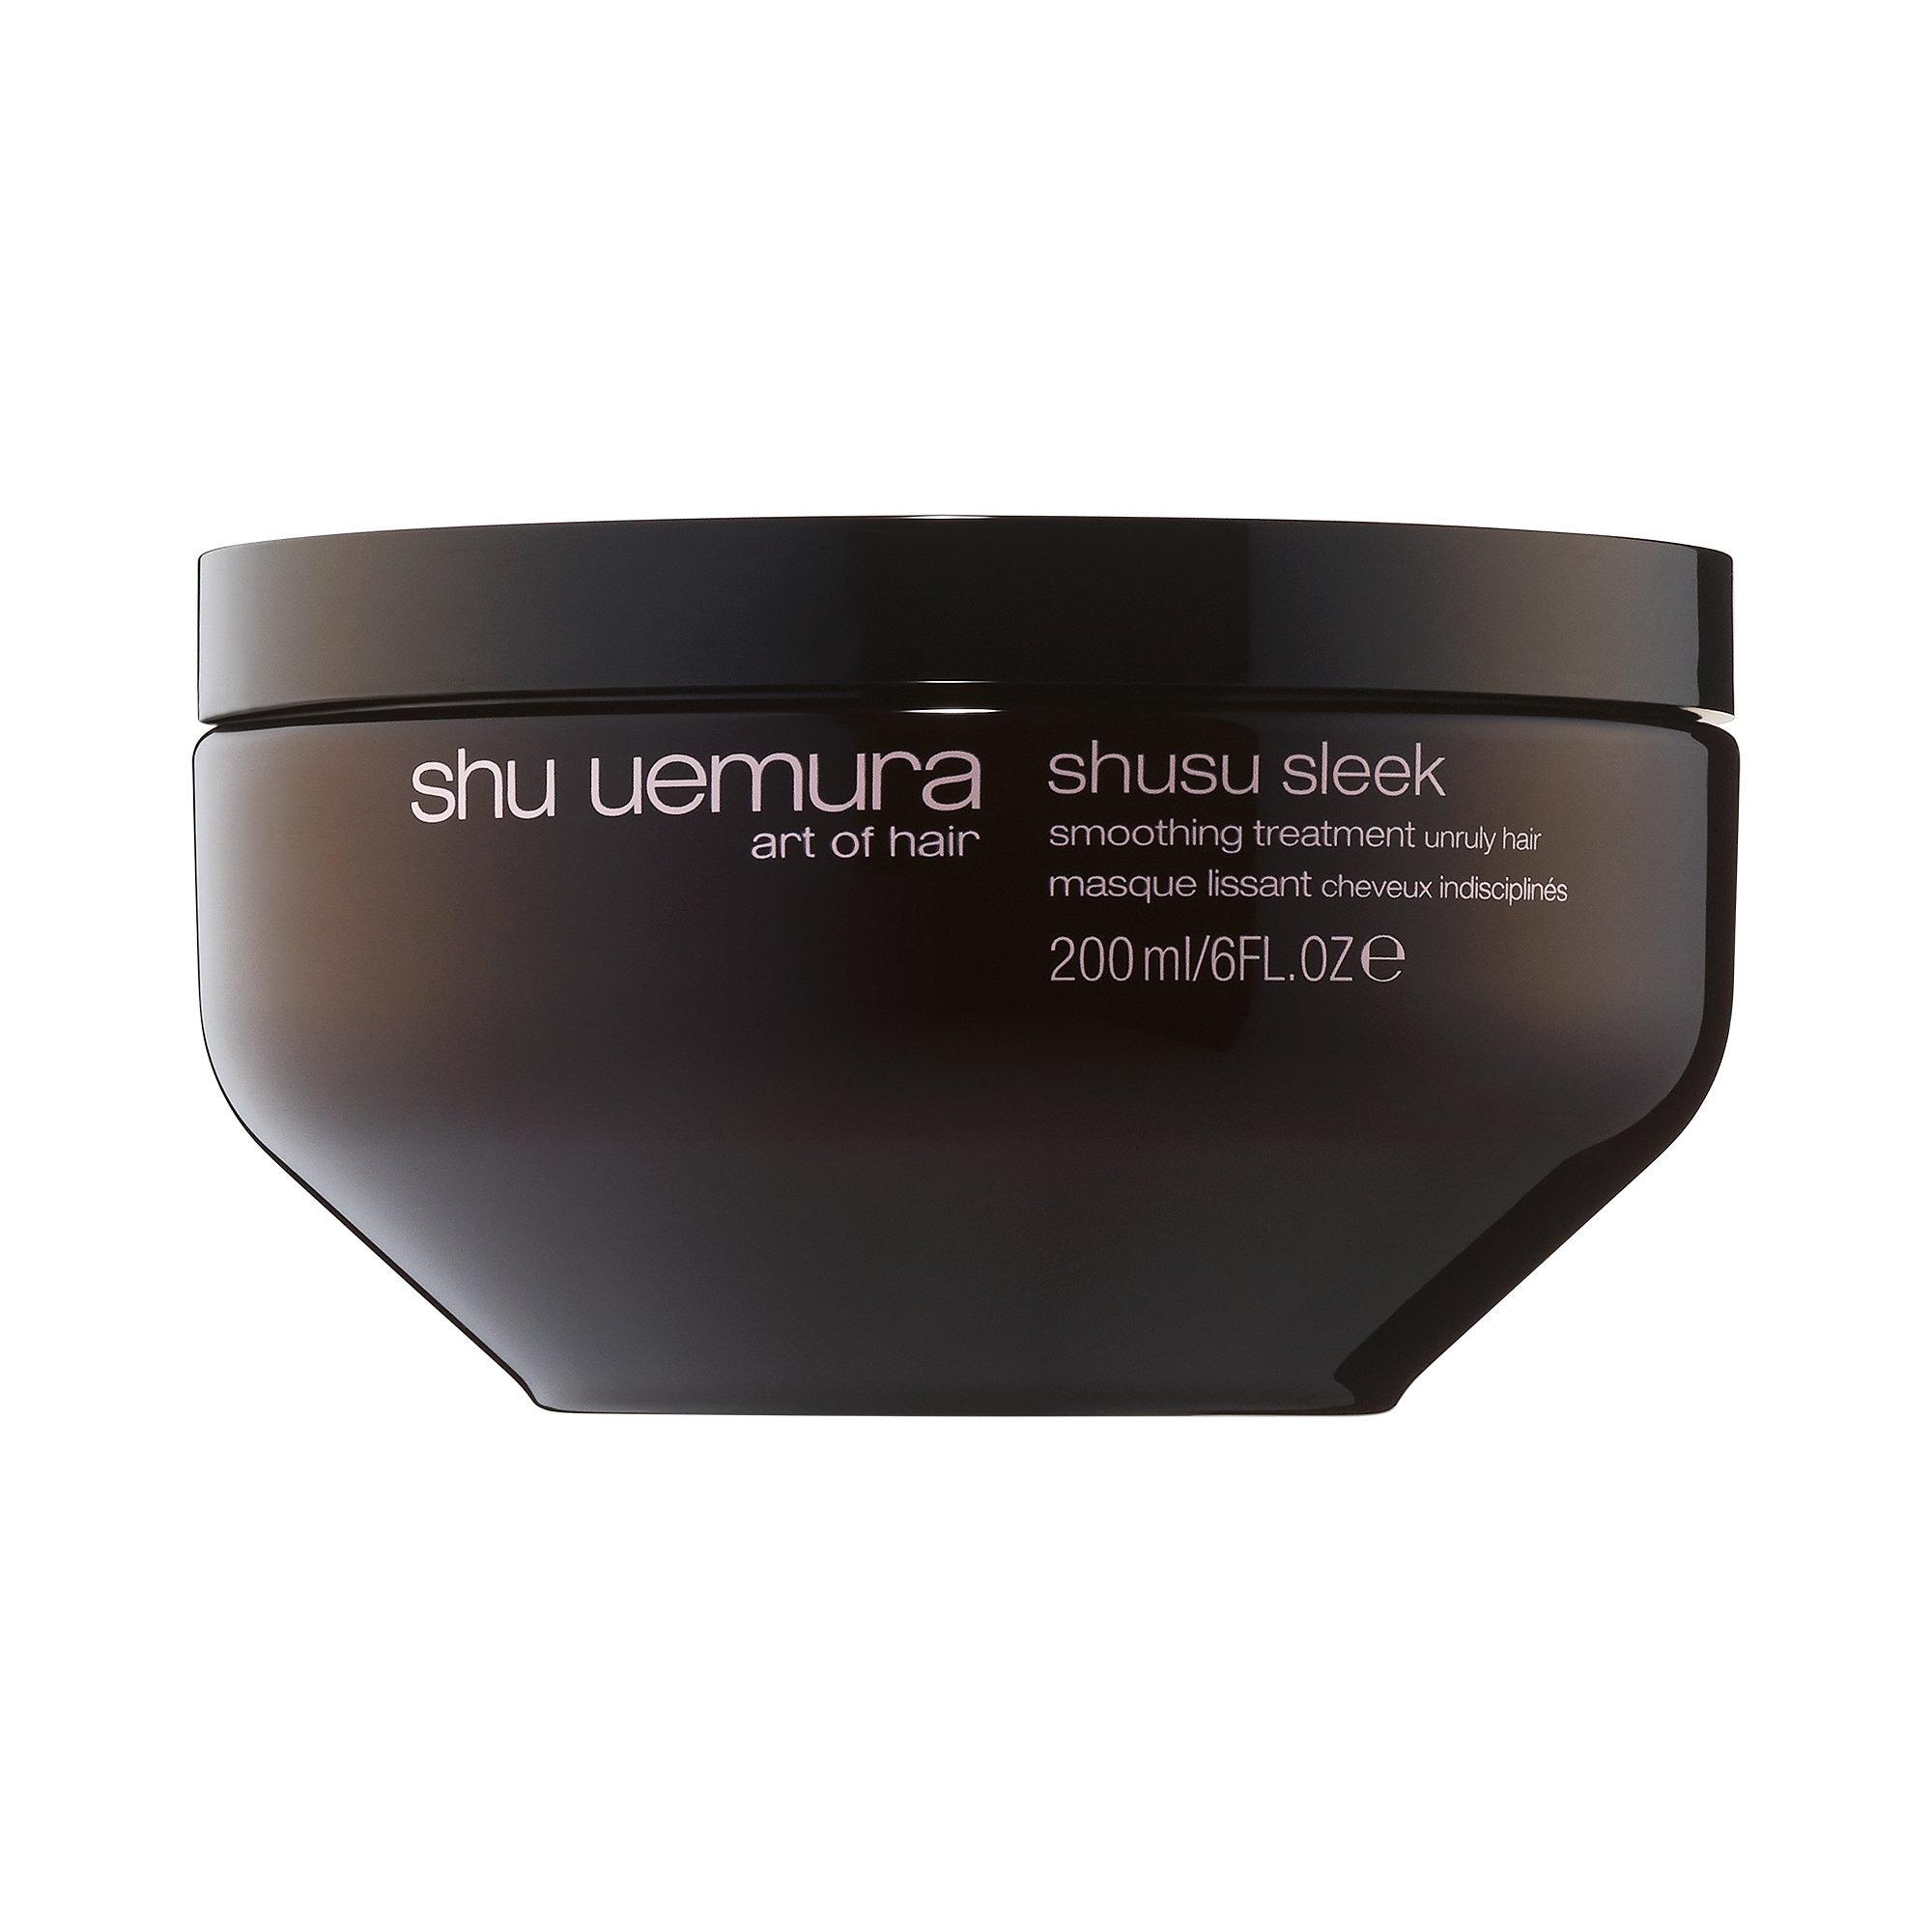 Shu Uemura - Shusu Sleek Smoothing Treatment- For Unruly Hair